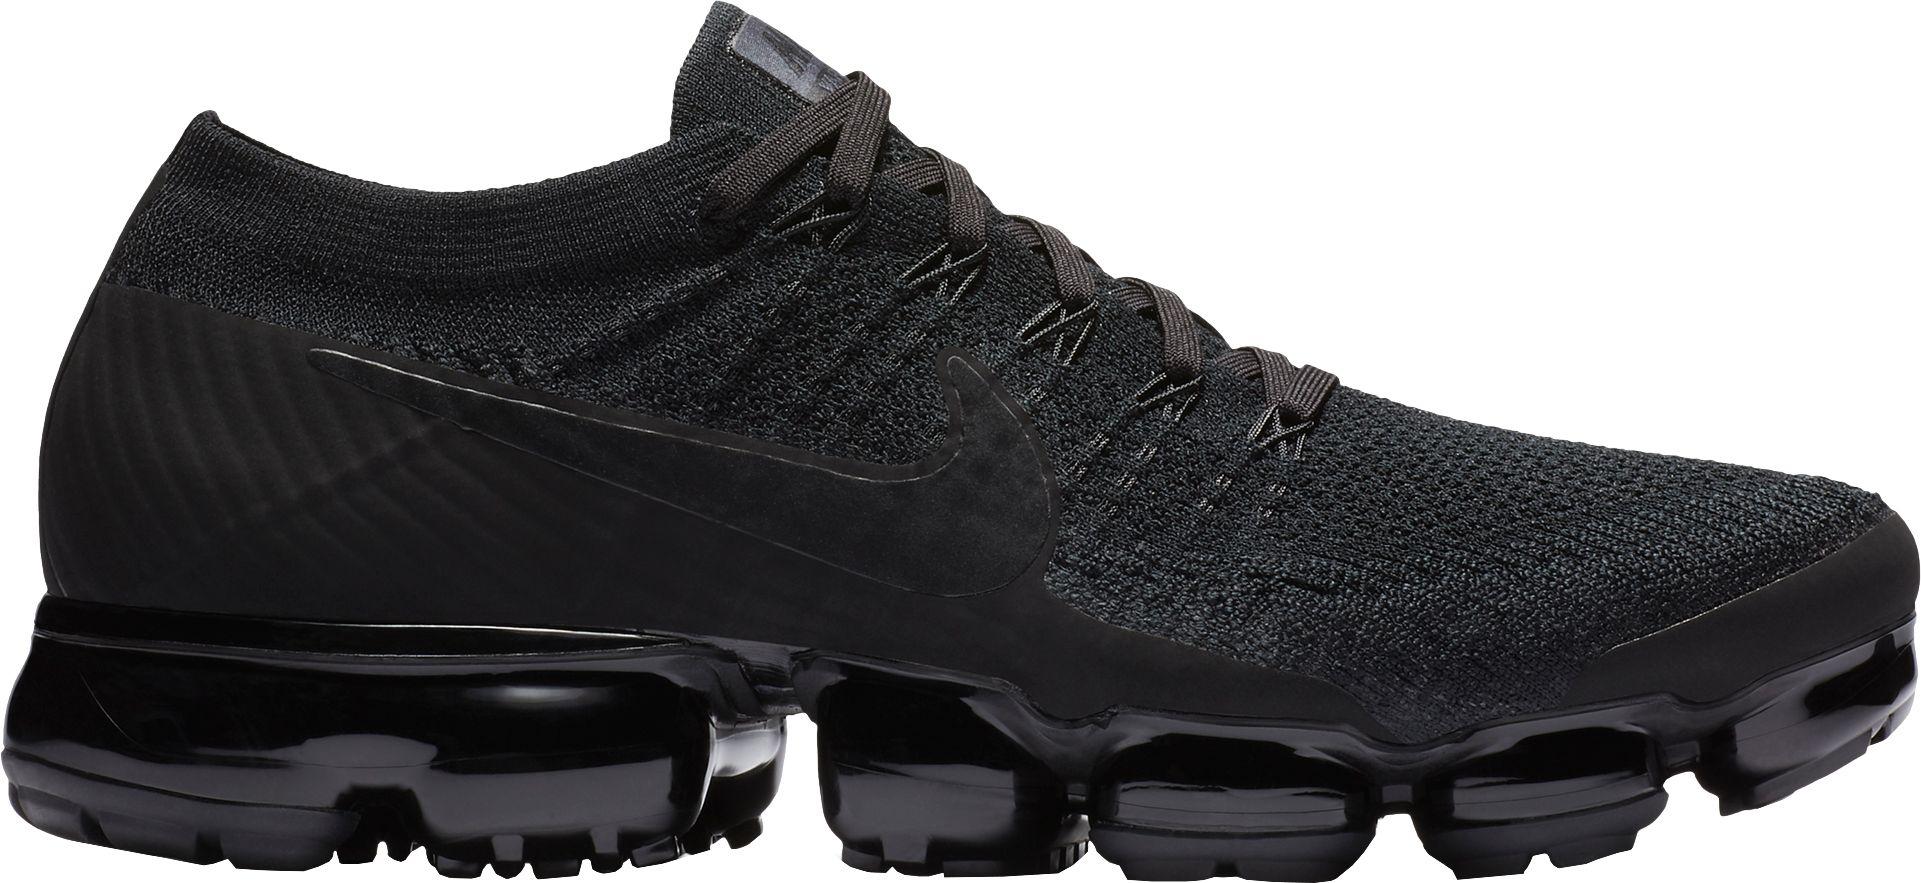 b0b64b6056 ... nike mens air vapormax flyknit running shoes dicks sporting goods